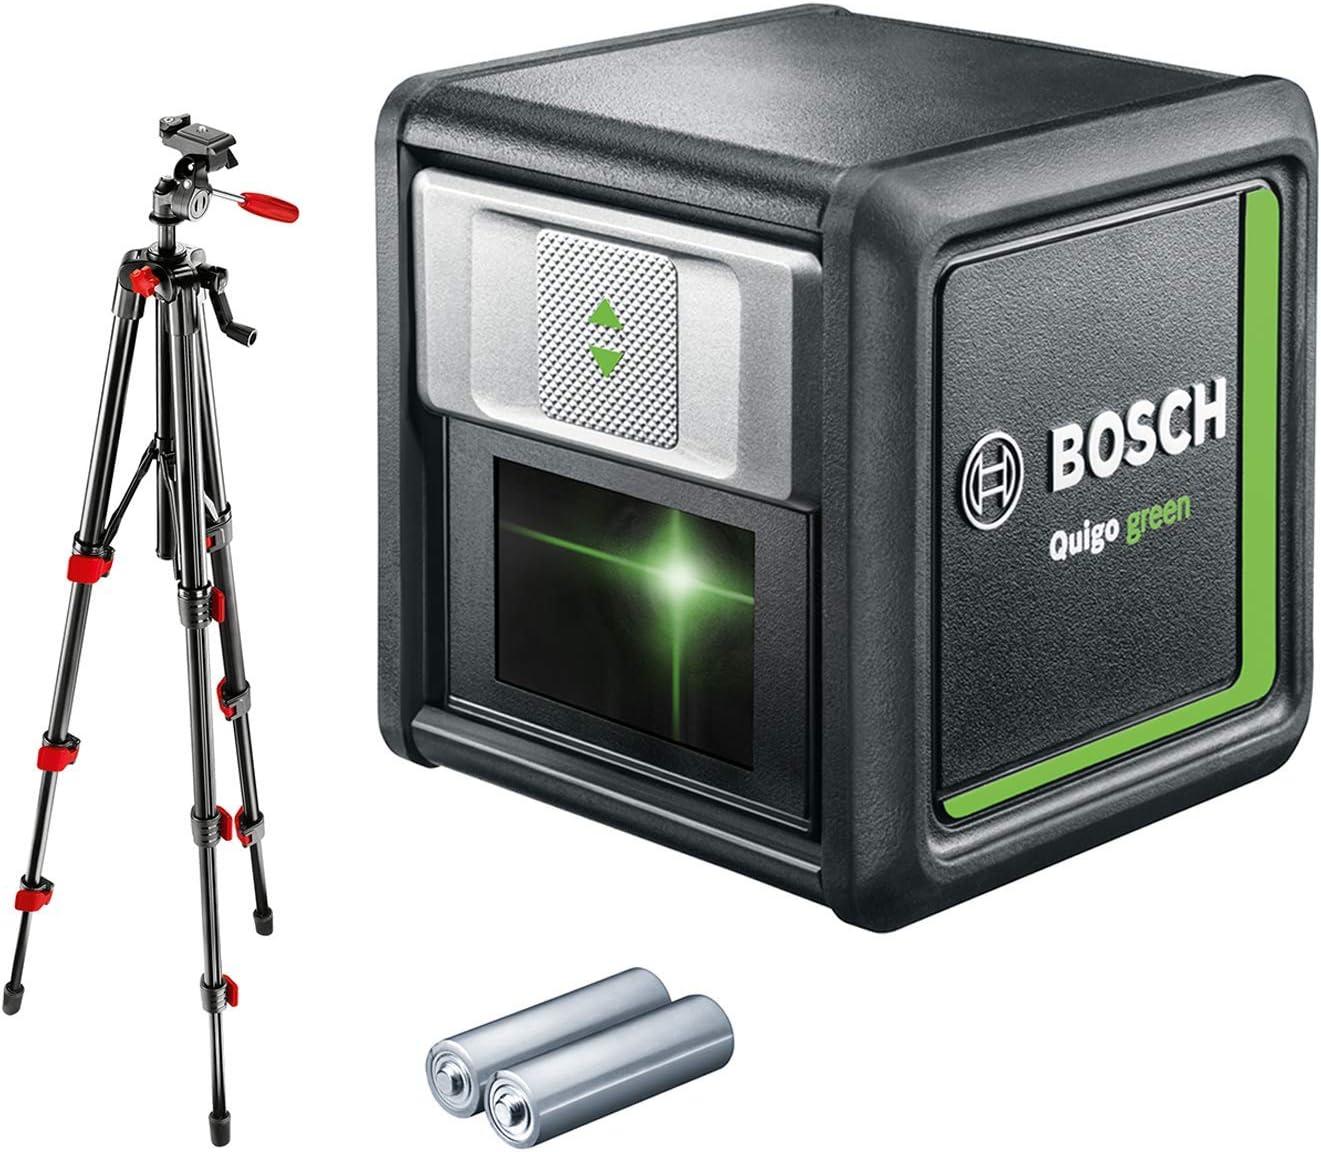 T/él/ém/ètre Laser Bosch Quigo Green Set